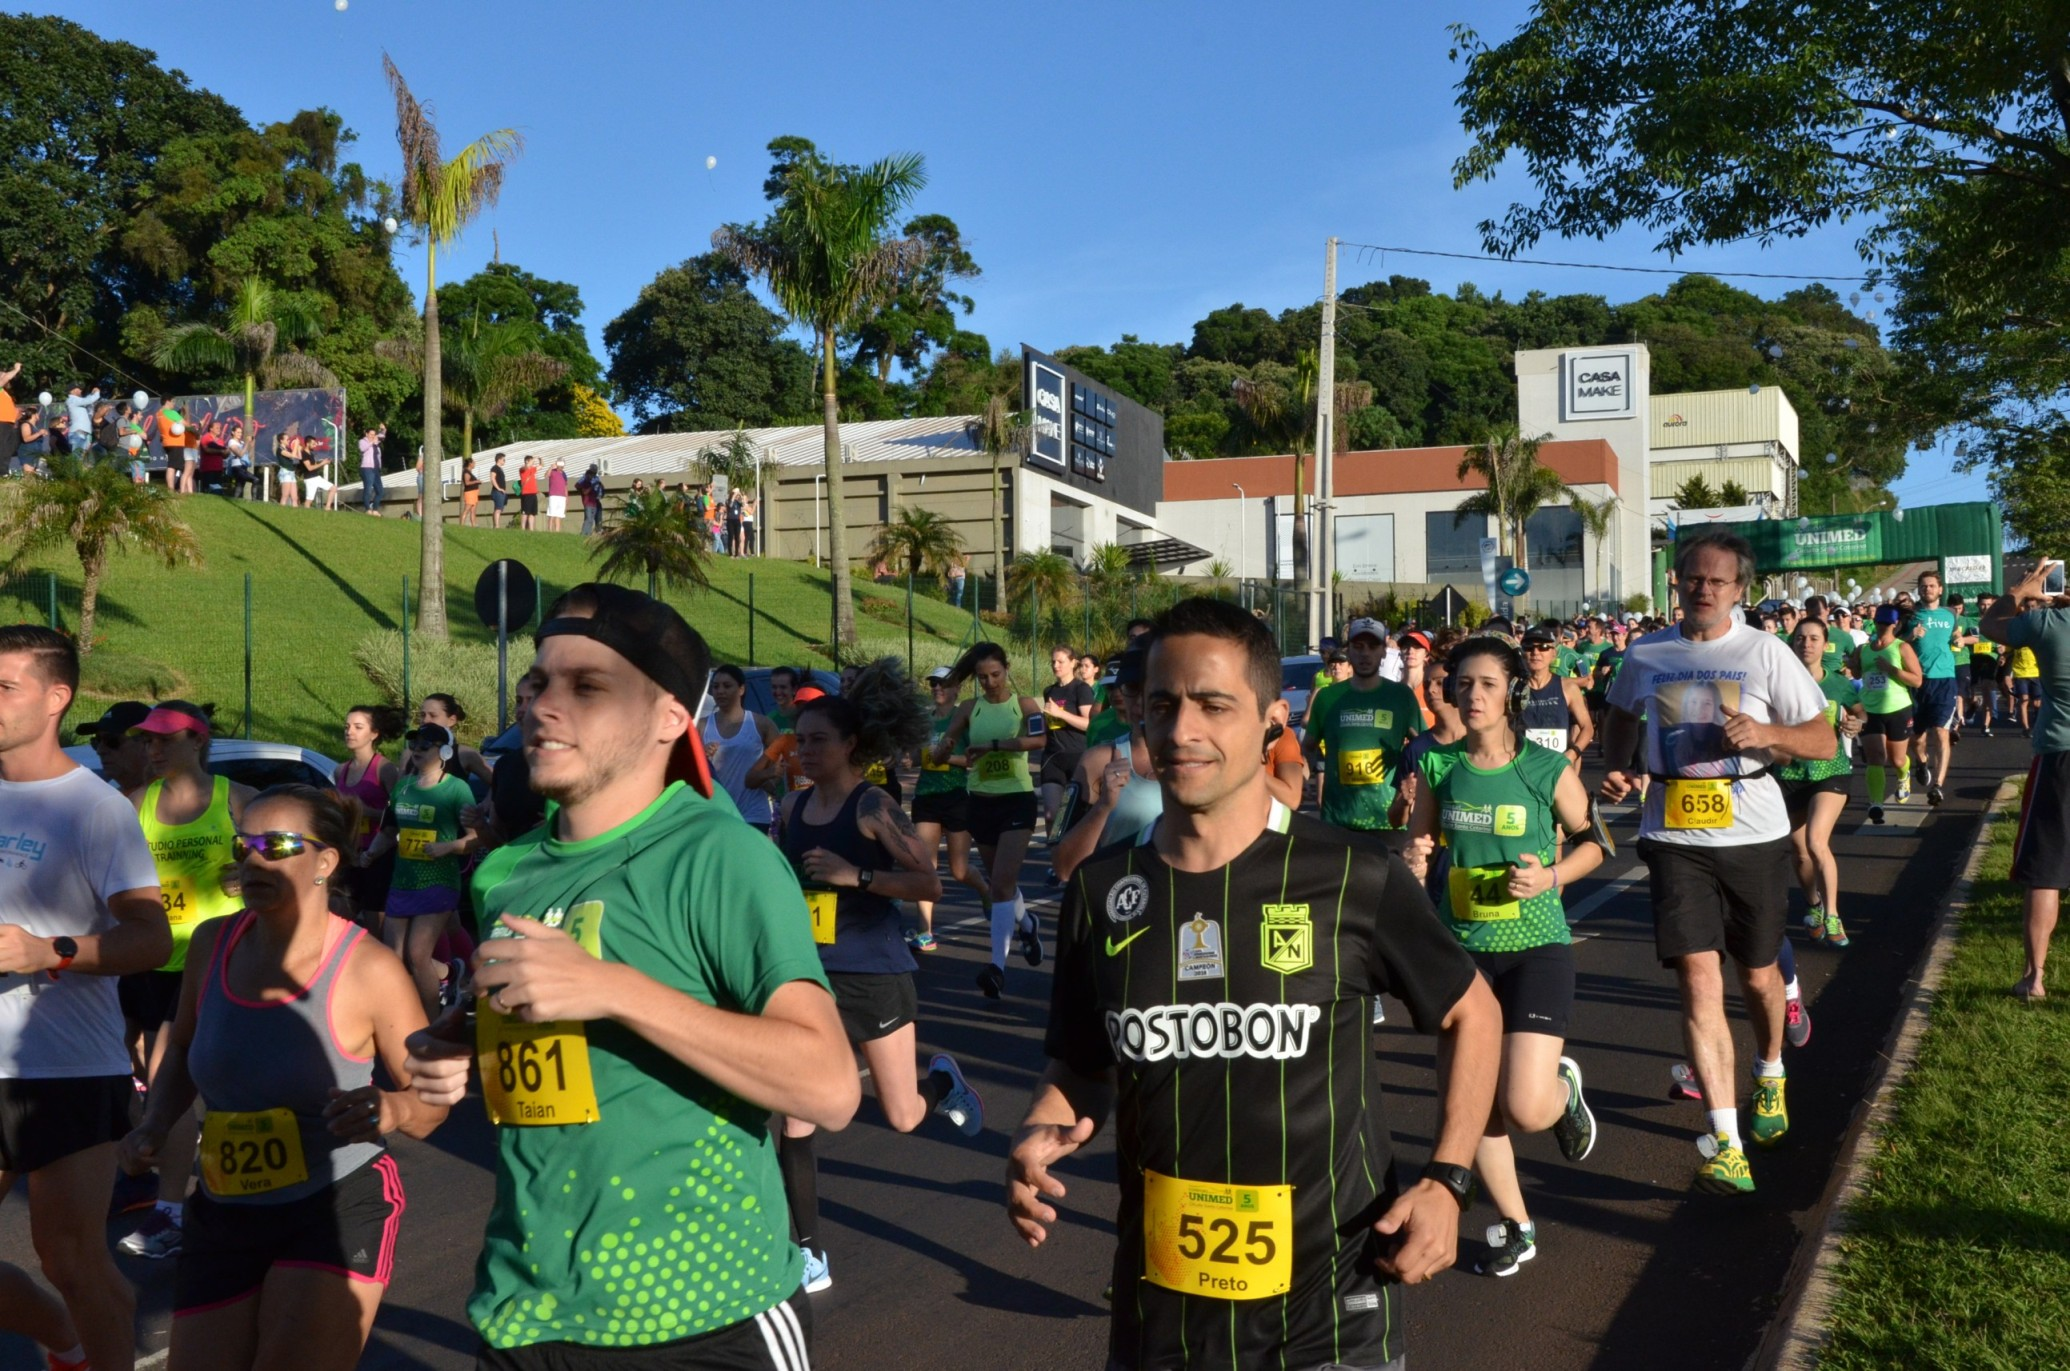 DI Online - Corrida de rua da Unimed reúne mil atletas em Chapecó 32decdf5480